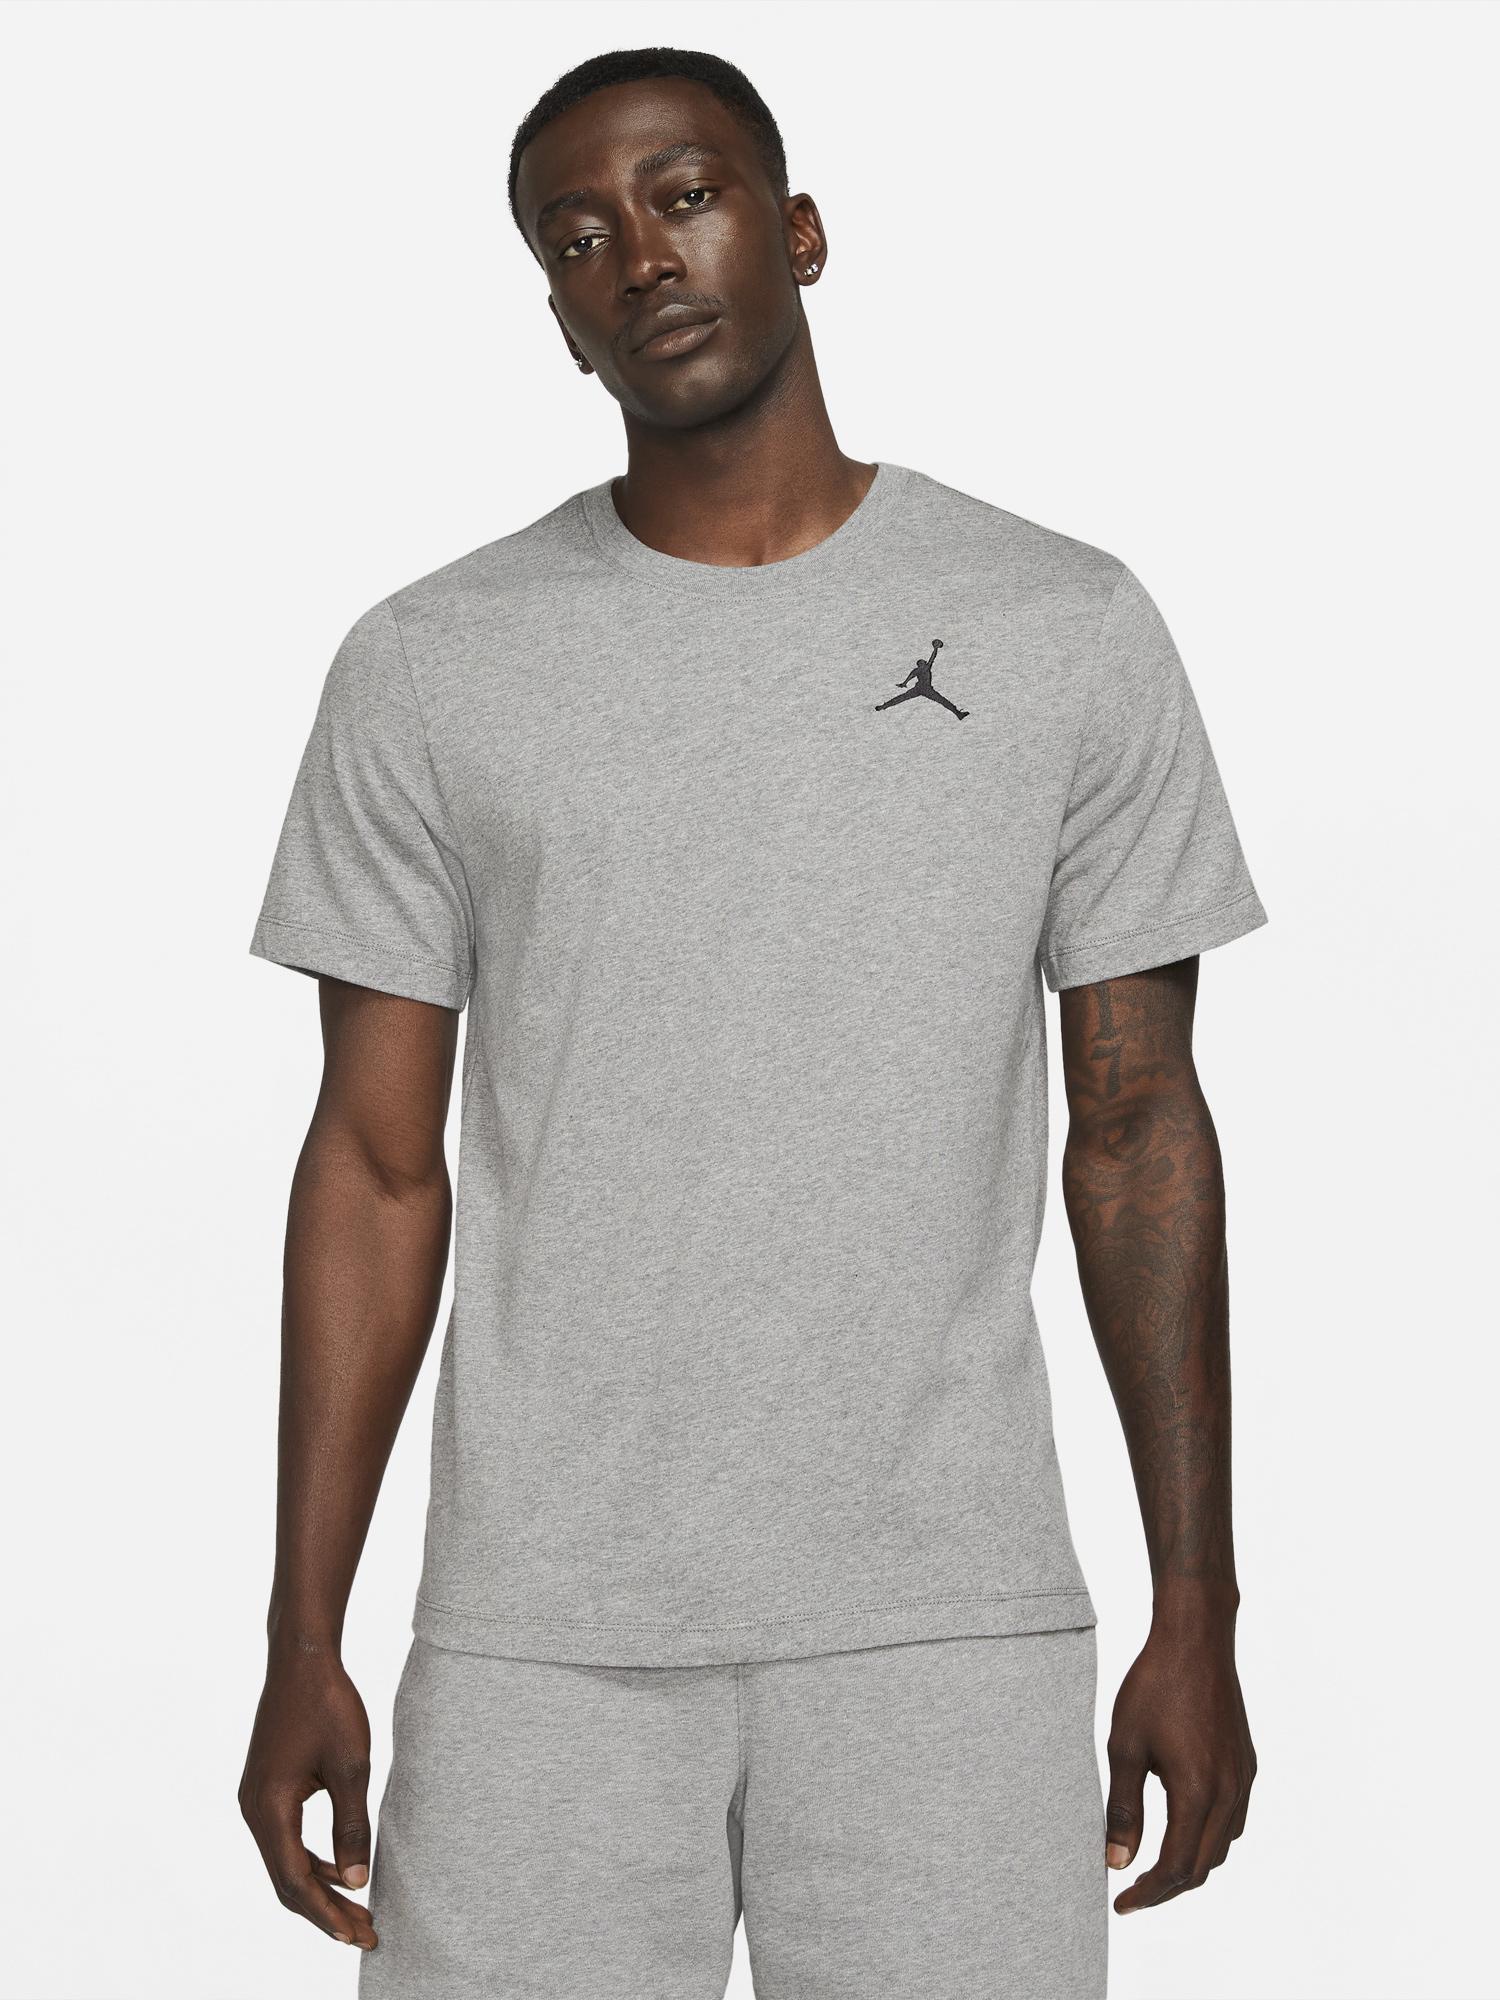 jordan-carbon-heather-grey-jumpman-embroidered-t-shirt-1